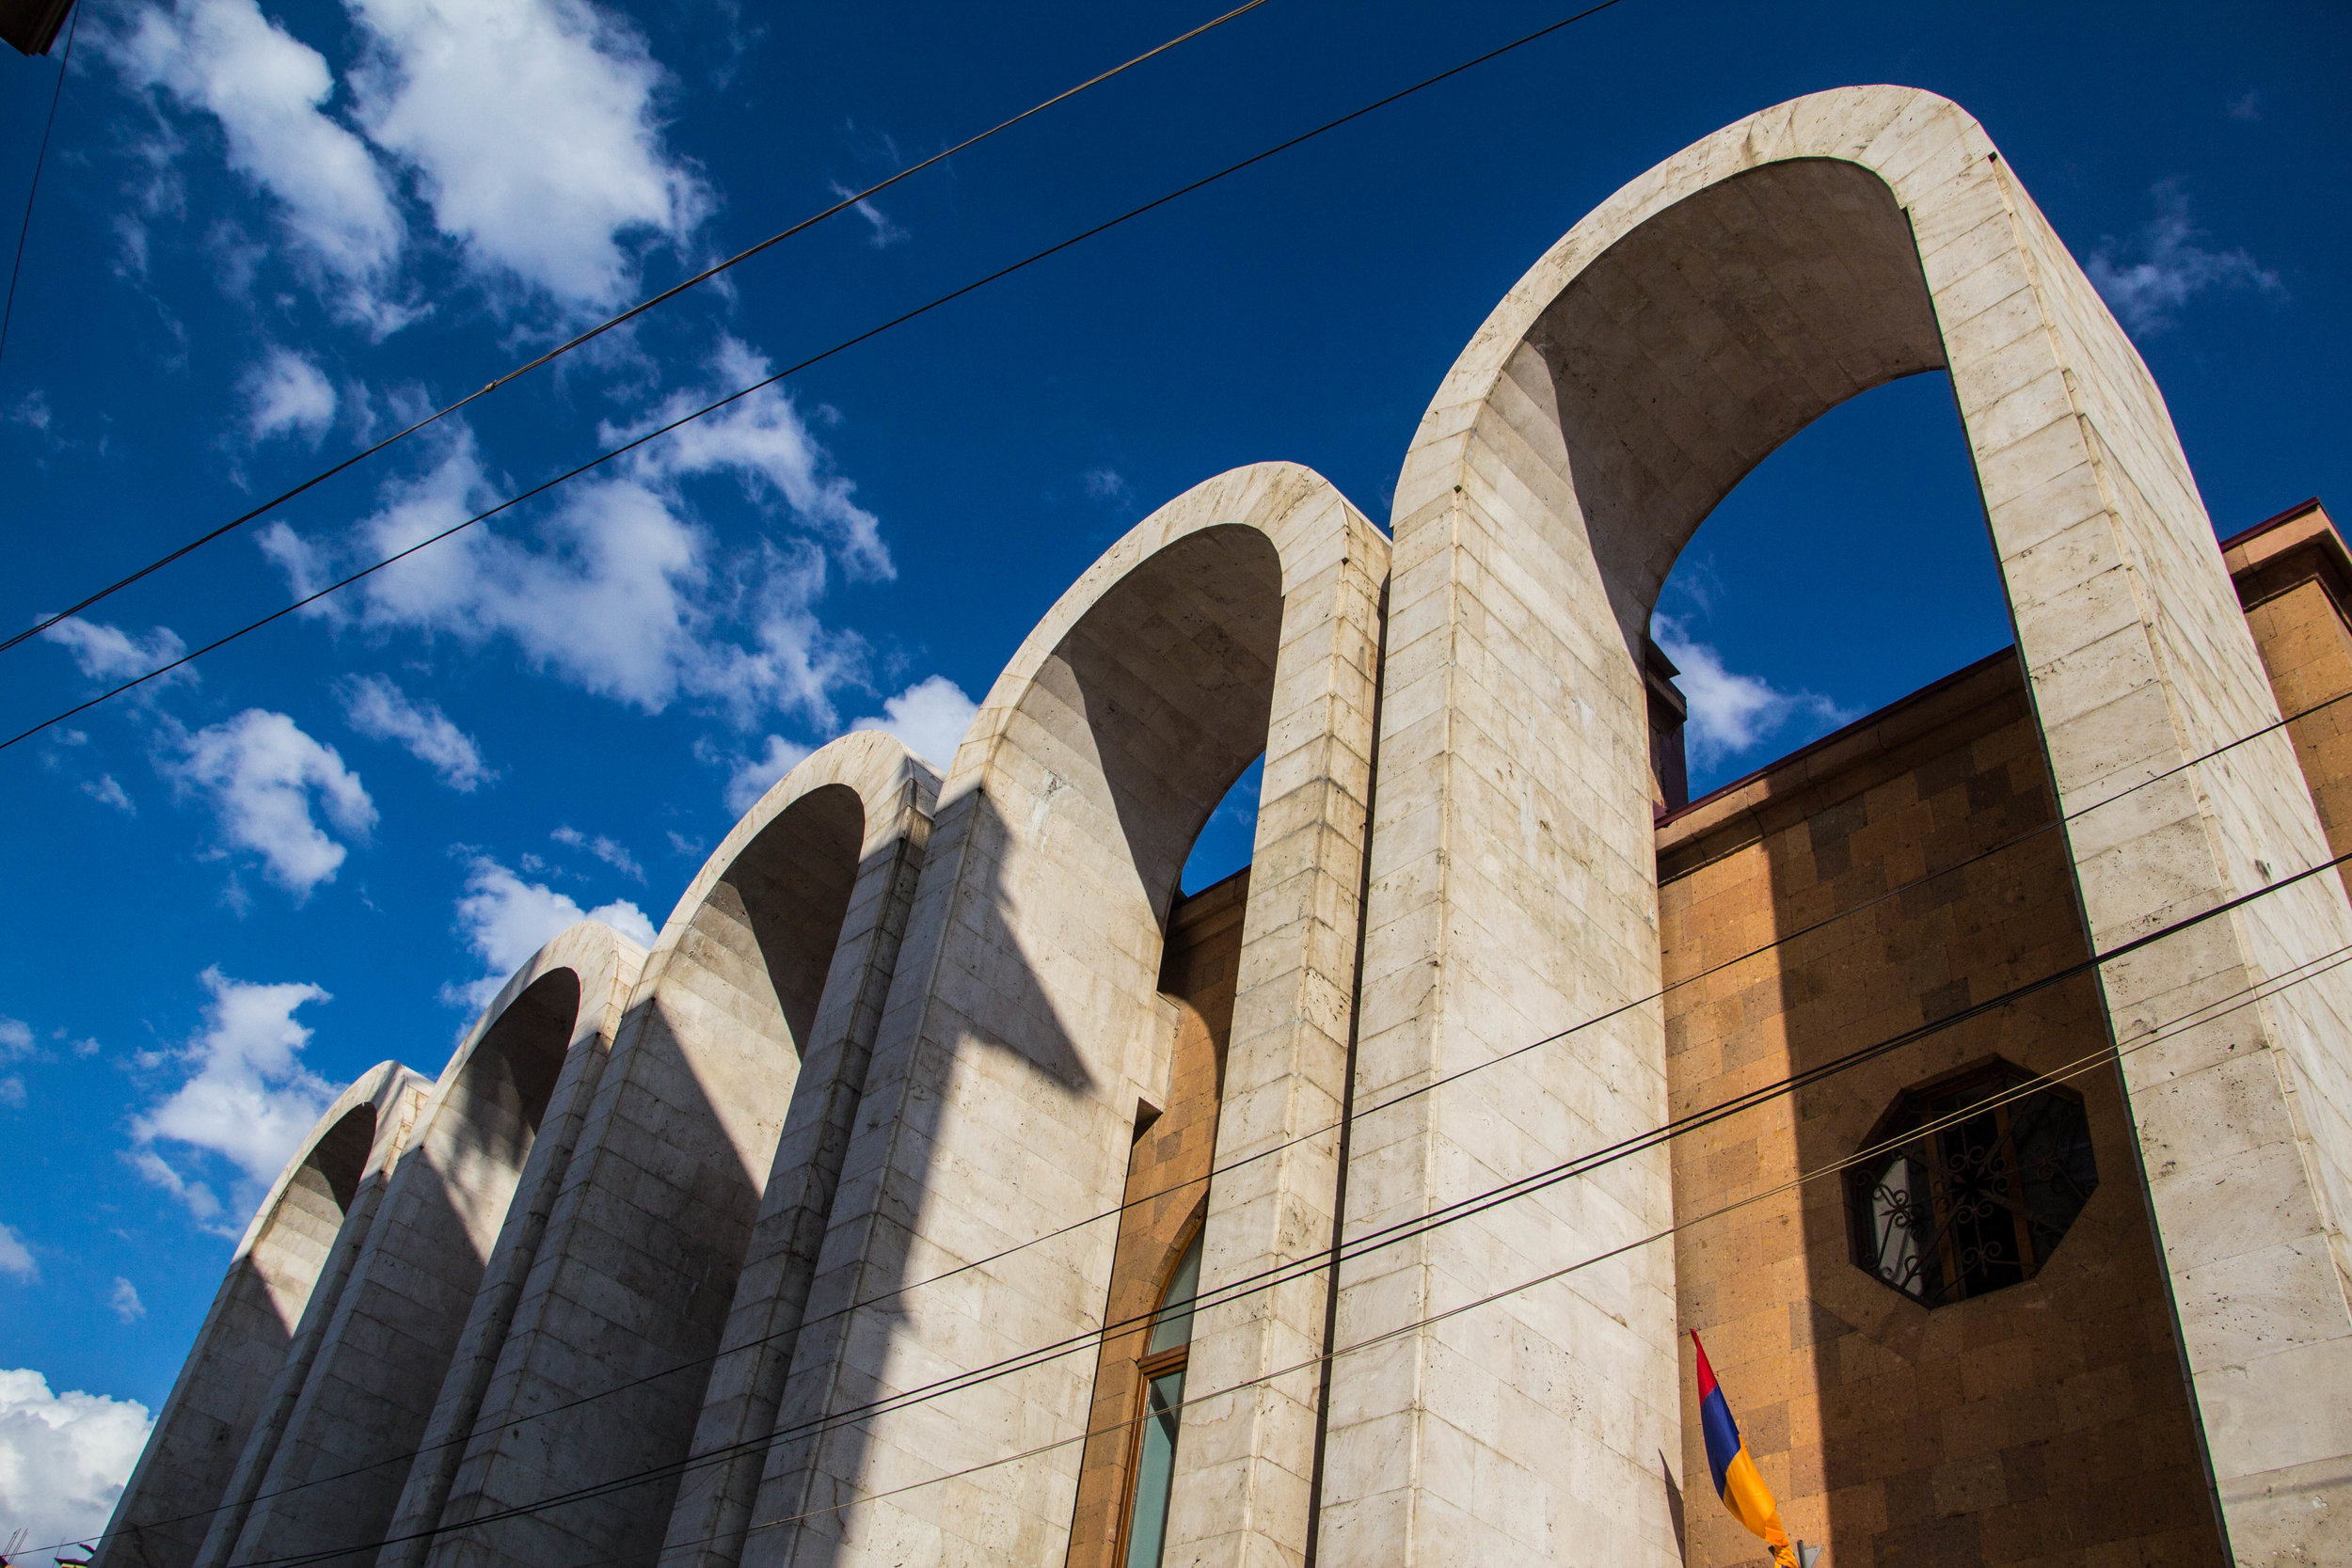 yerevan-armenia-streets-2-8.jpg